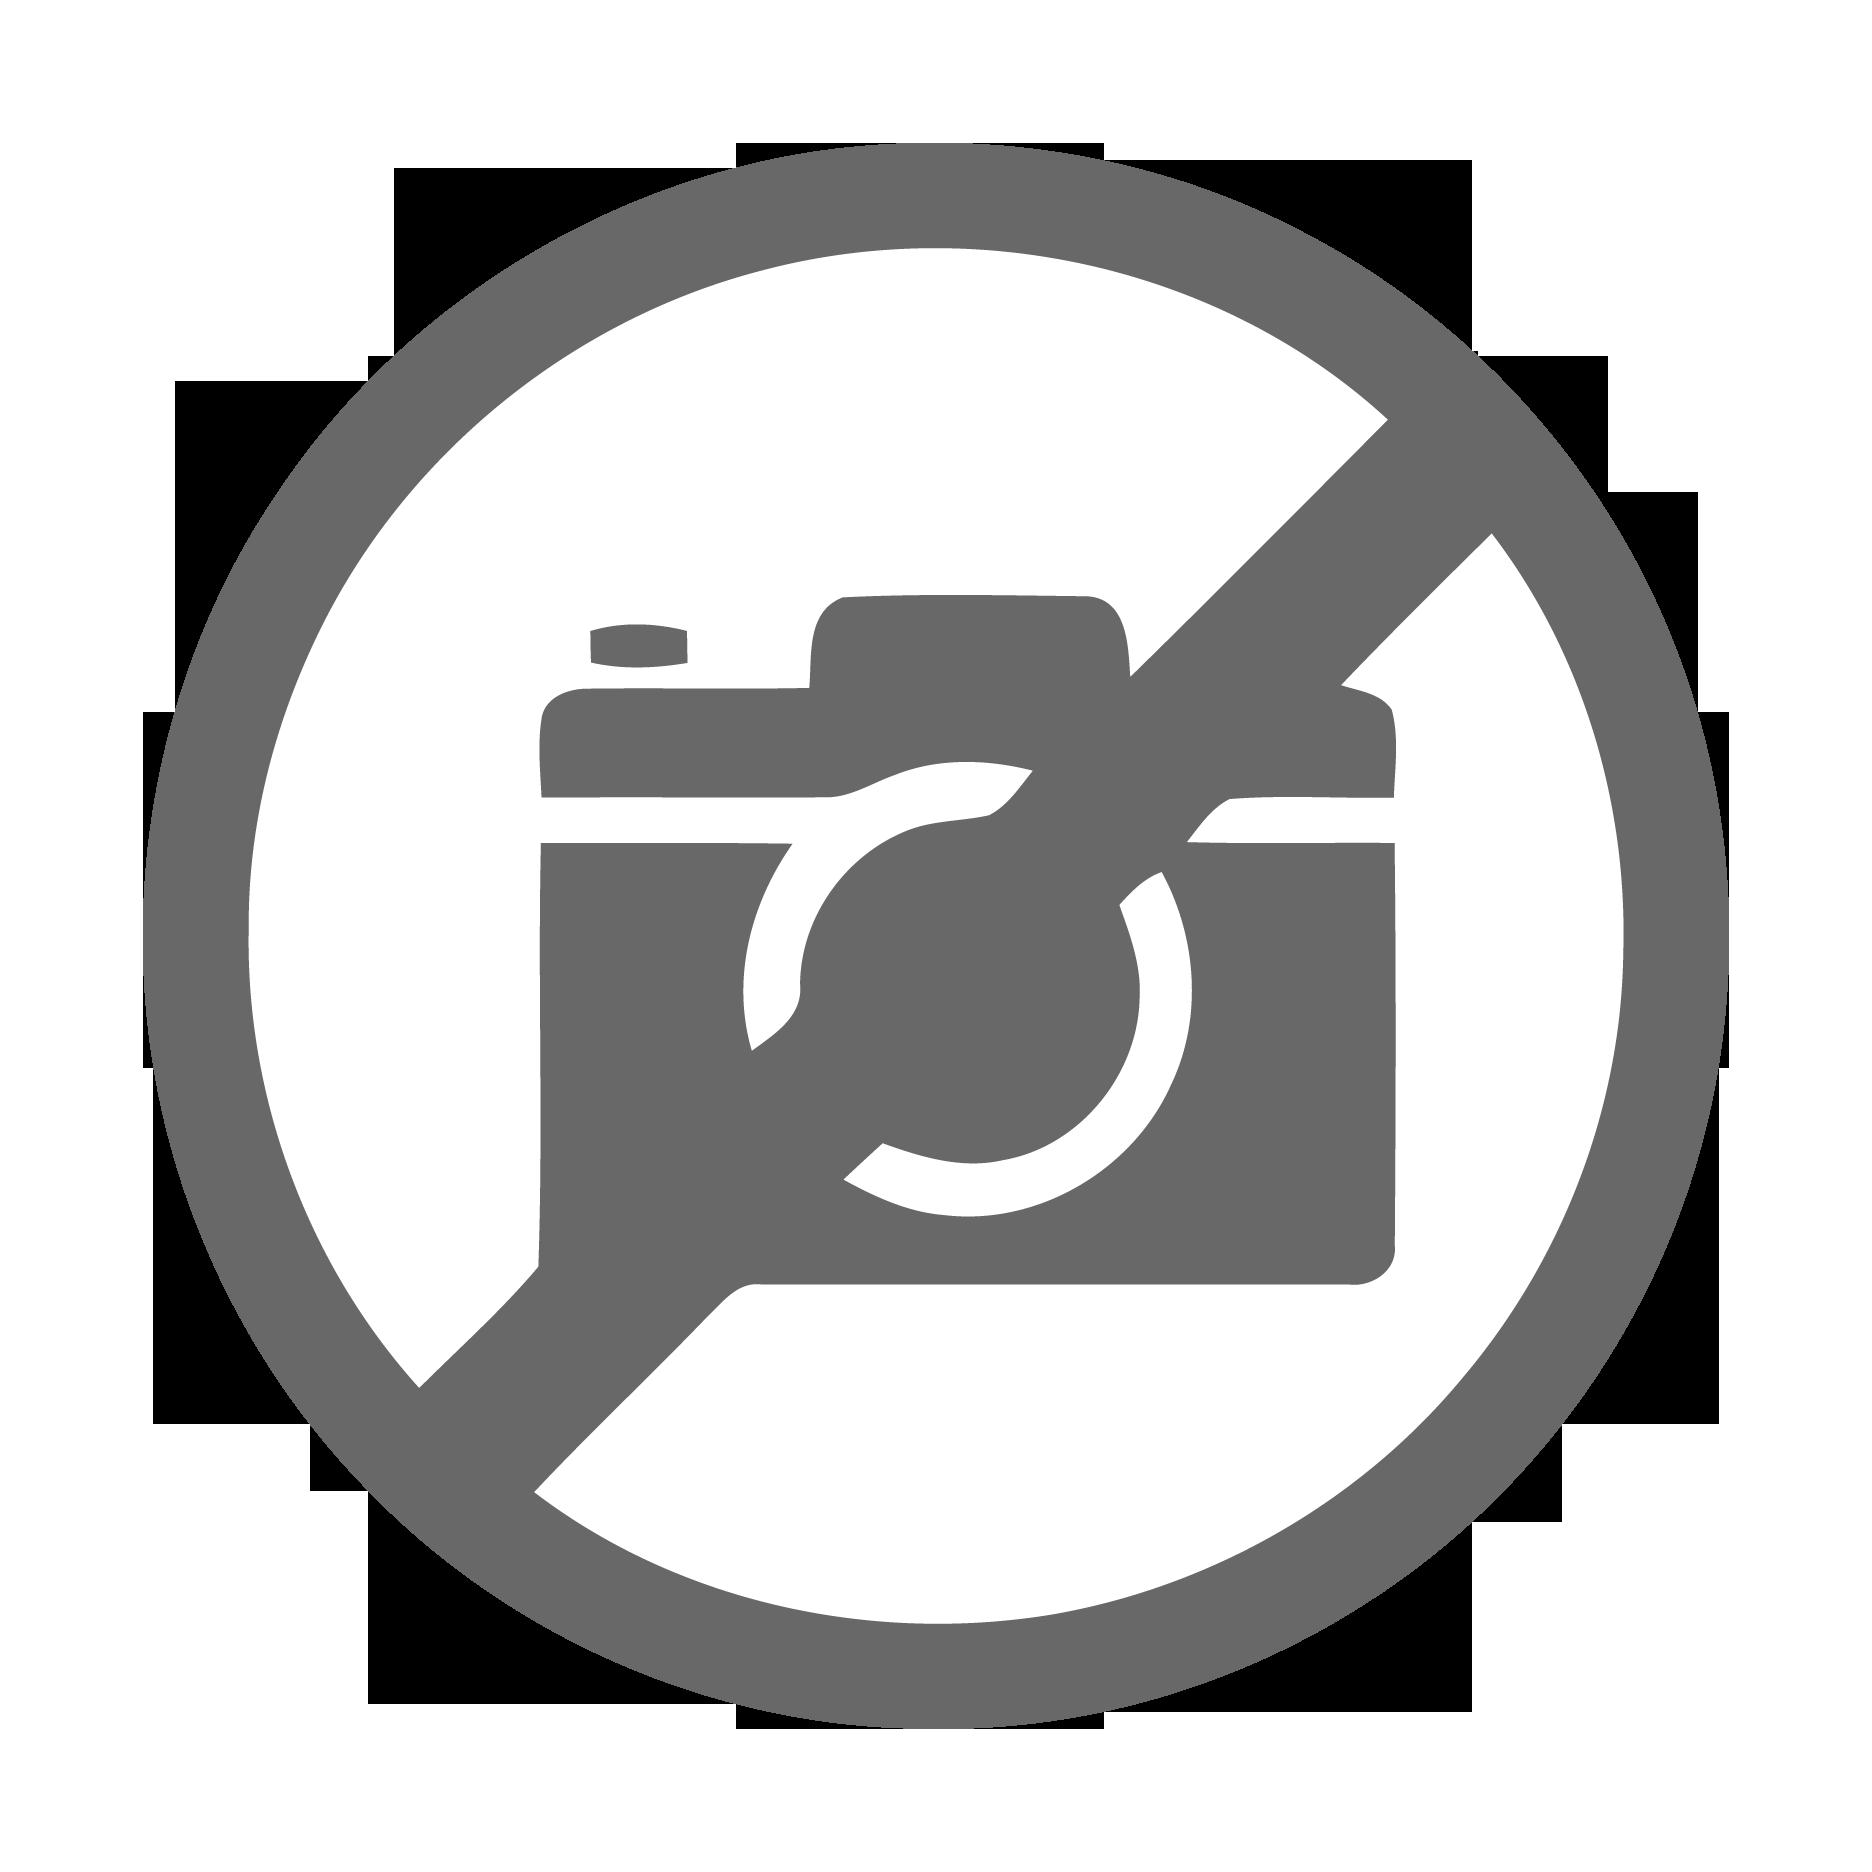 Babino Selo Varna